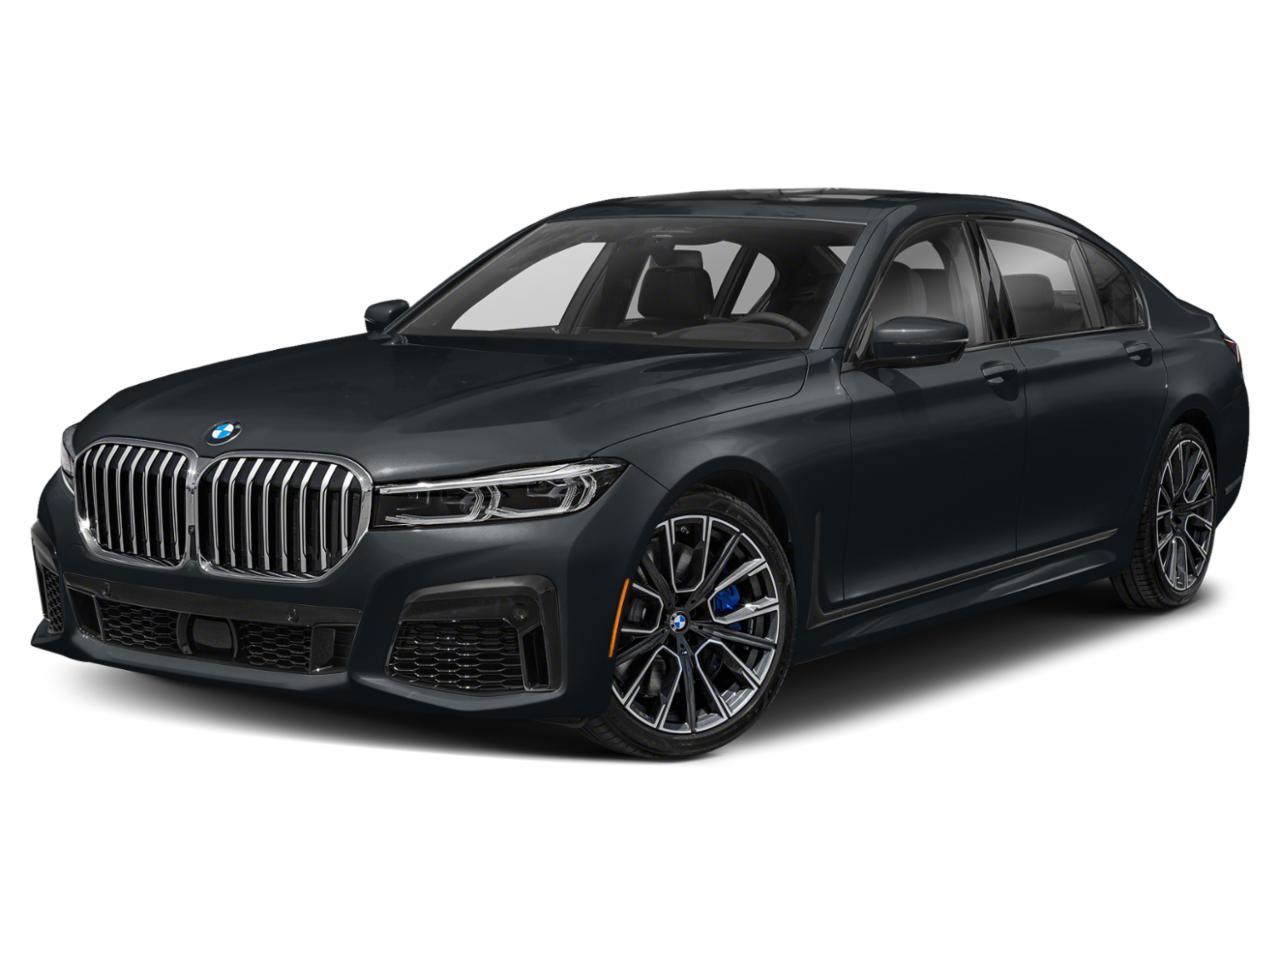 2022 BMW 750i xDrive Vehicle Photo in PLANO, TX 75024-3599